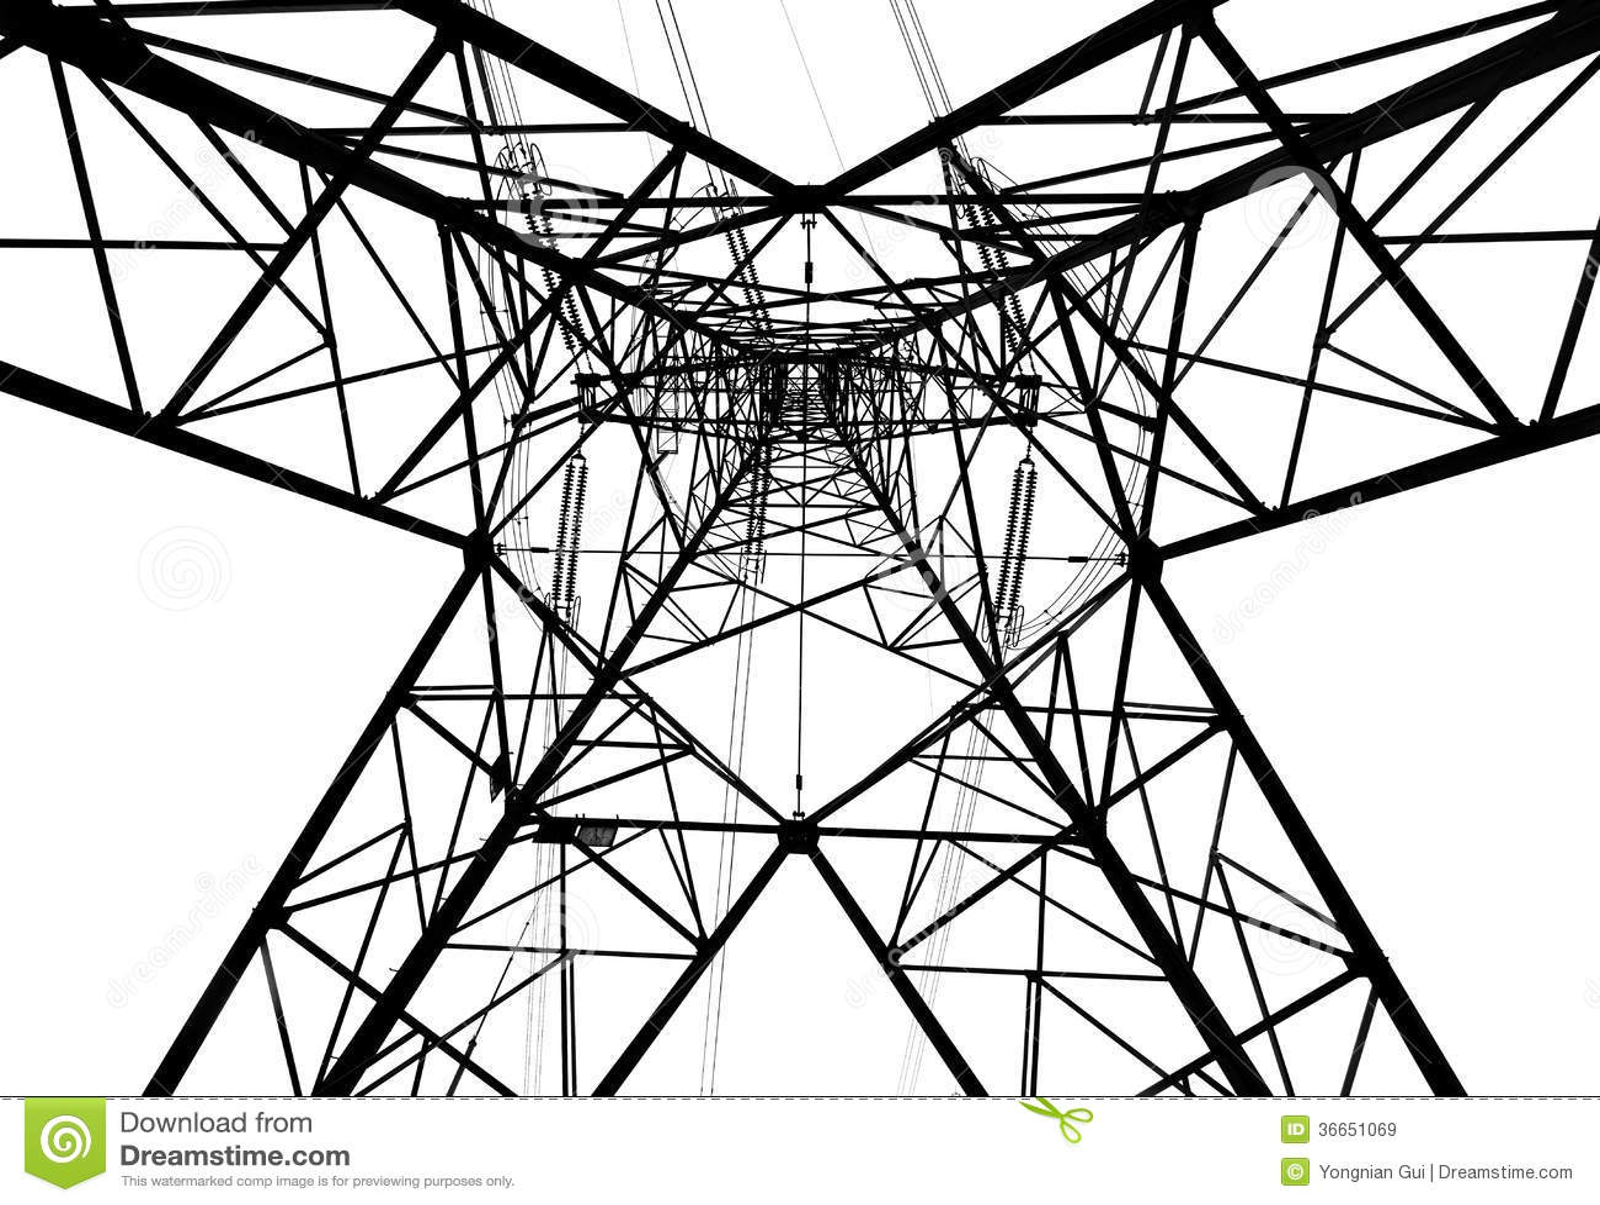 Electricity Pylon Stock Image Image Of Distribution